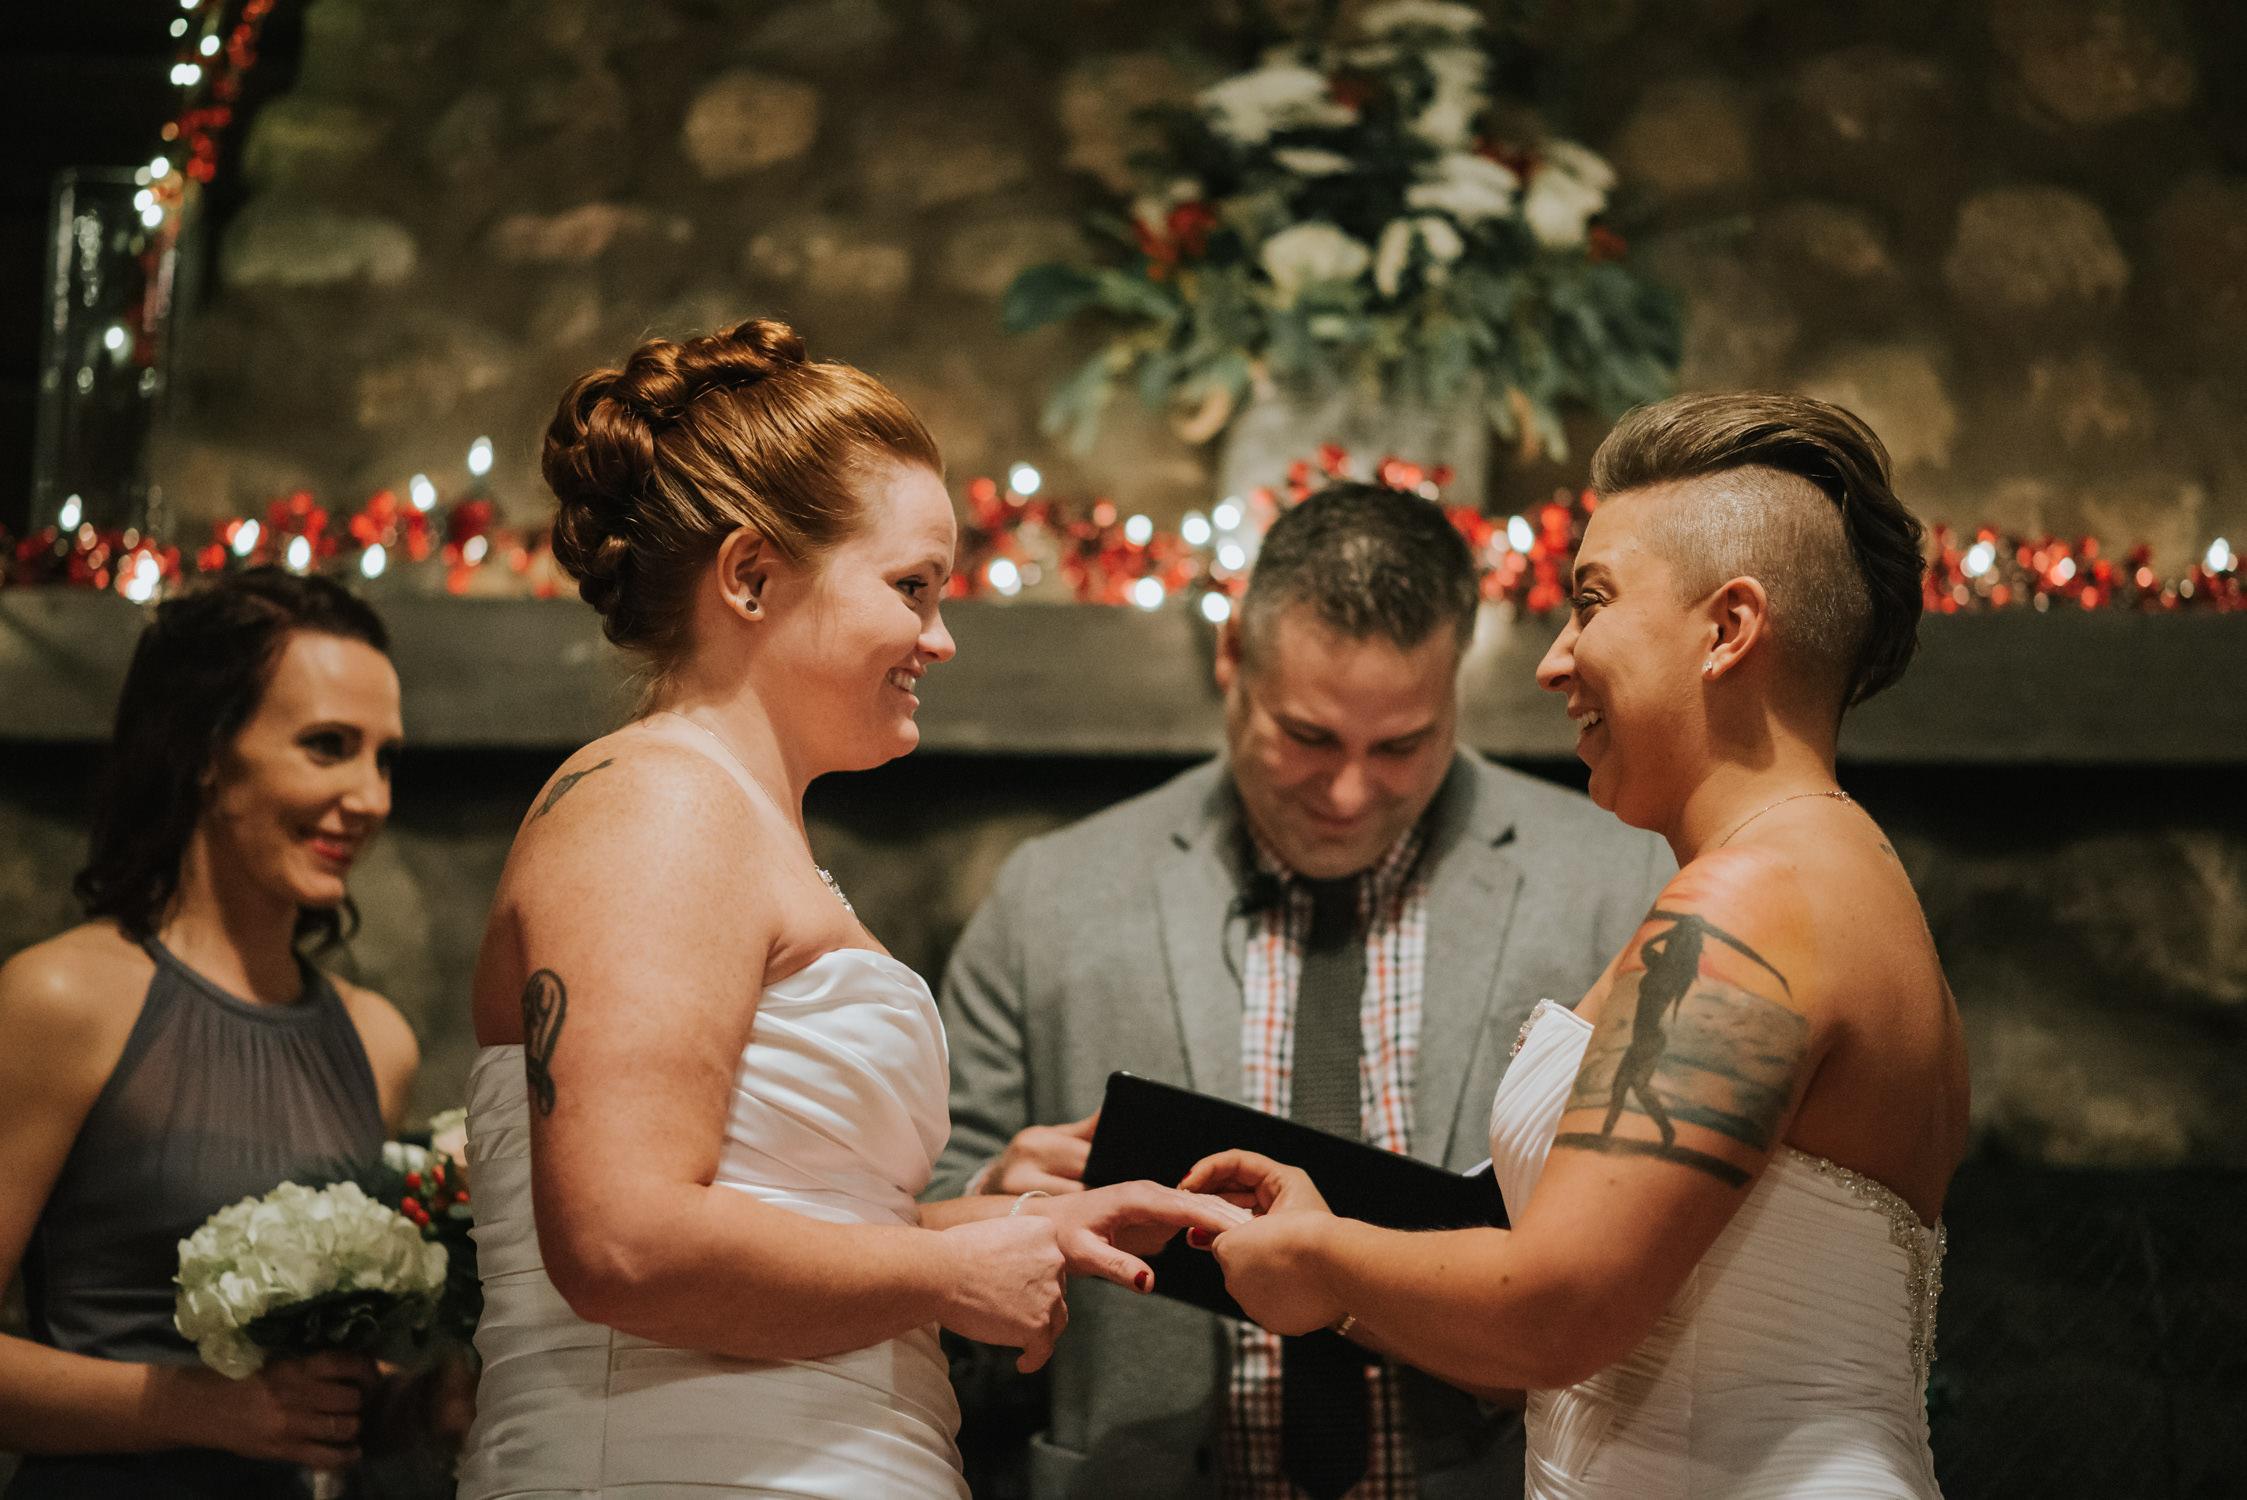 chicago, wedding photographer, northwest indiana, chicagoland, midwest, wedding, elopement, intimate, small, intimate wedding, photographer, photography, non-traditional,